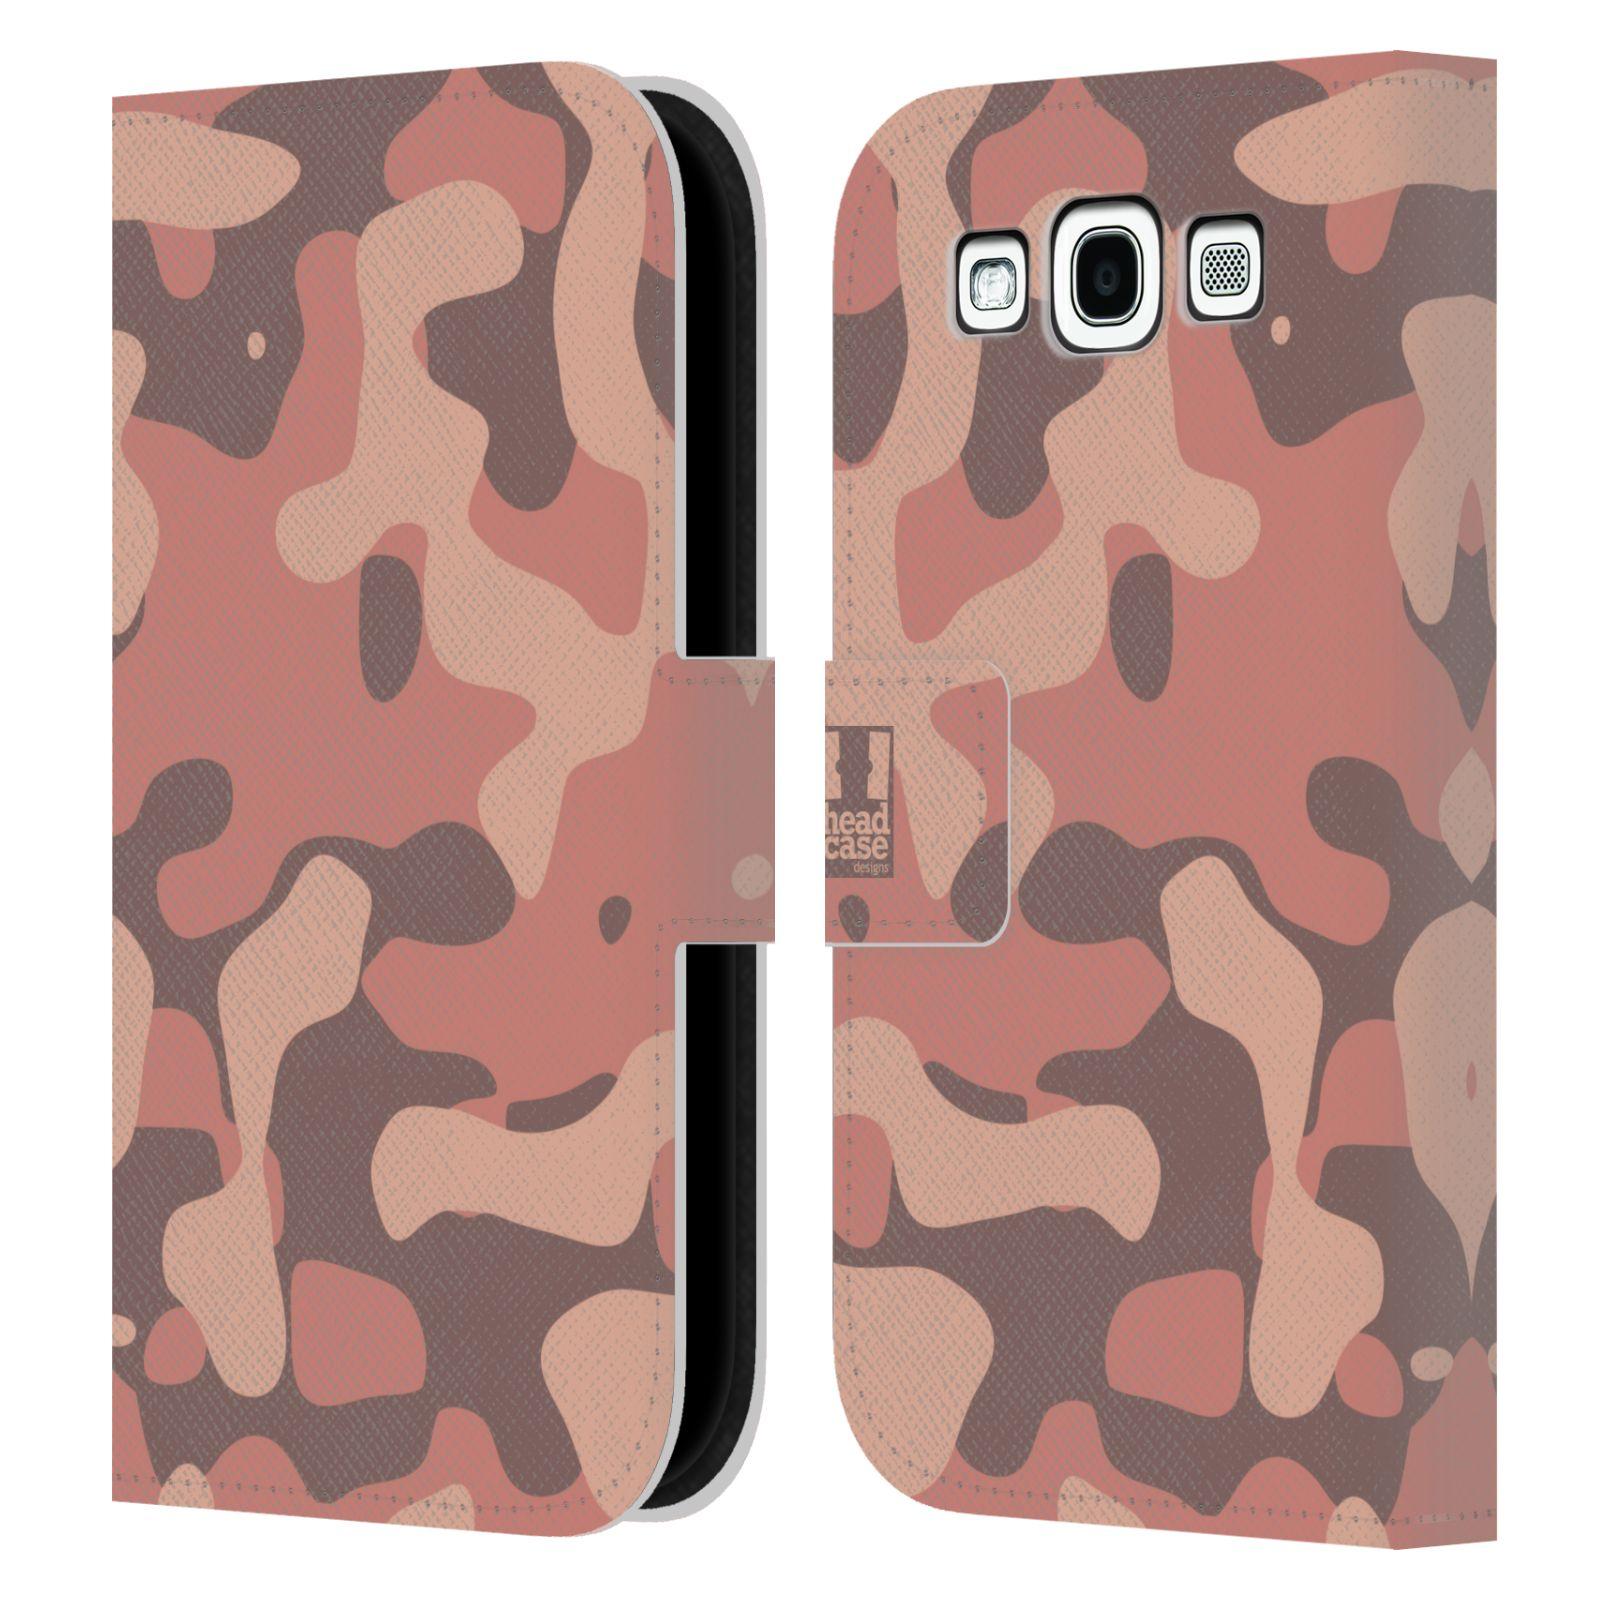 HEAD CASE Flipové pouzdro pro mobil Samsung Galaxy S3 lehká barevná kamufláž růžová, losos